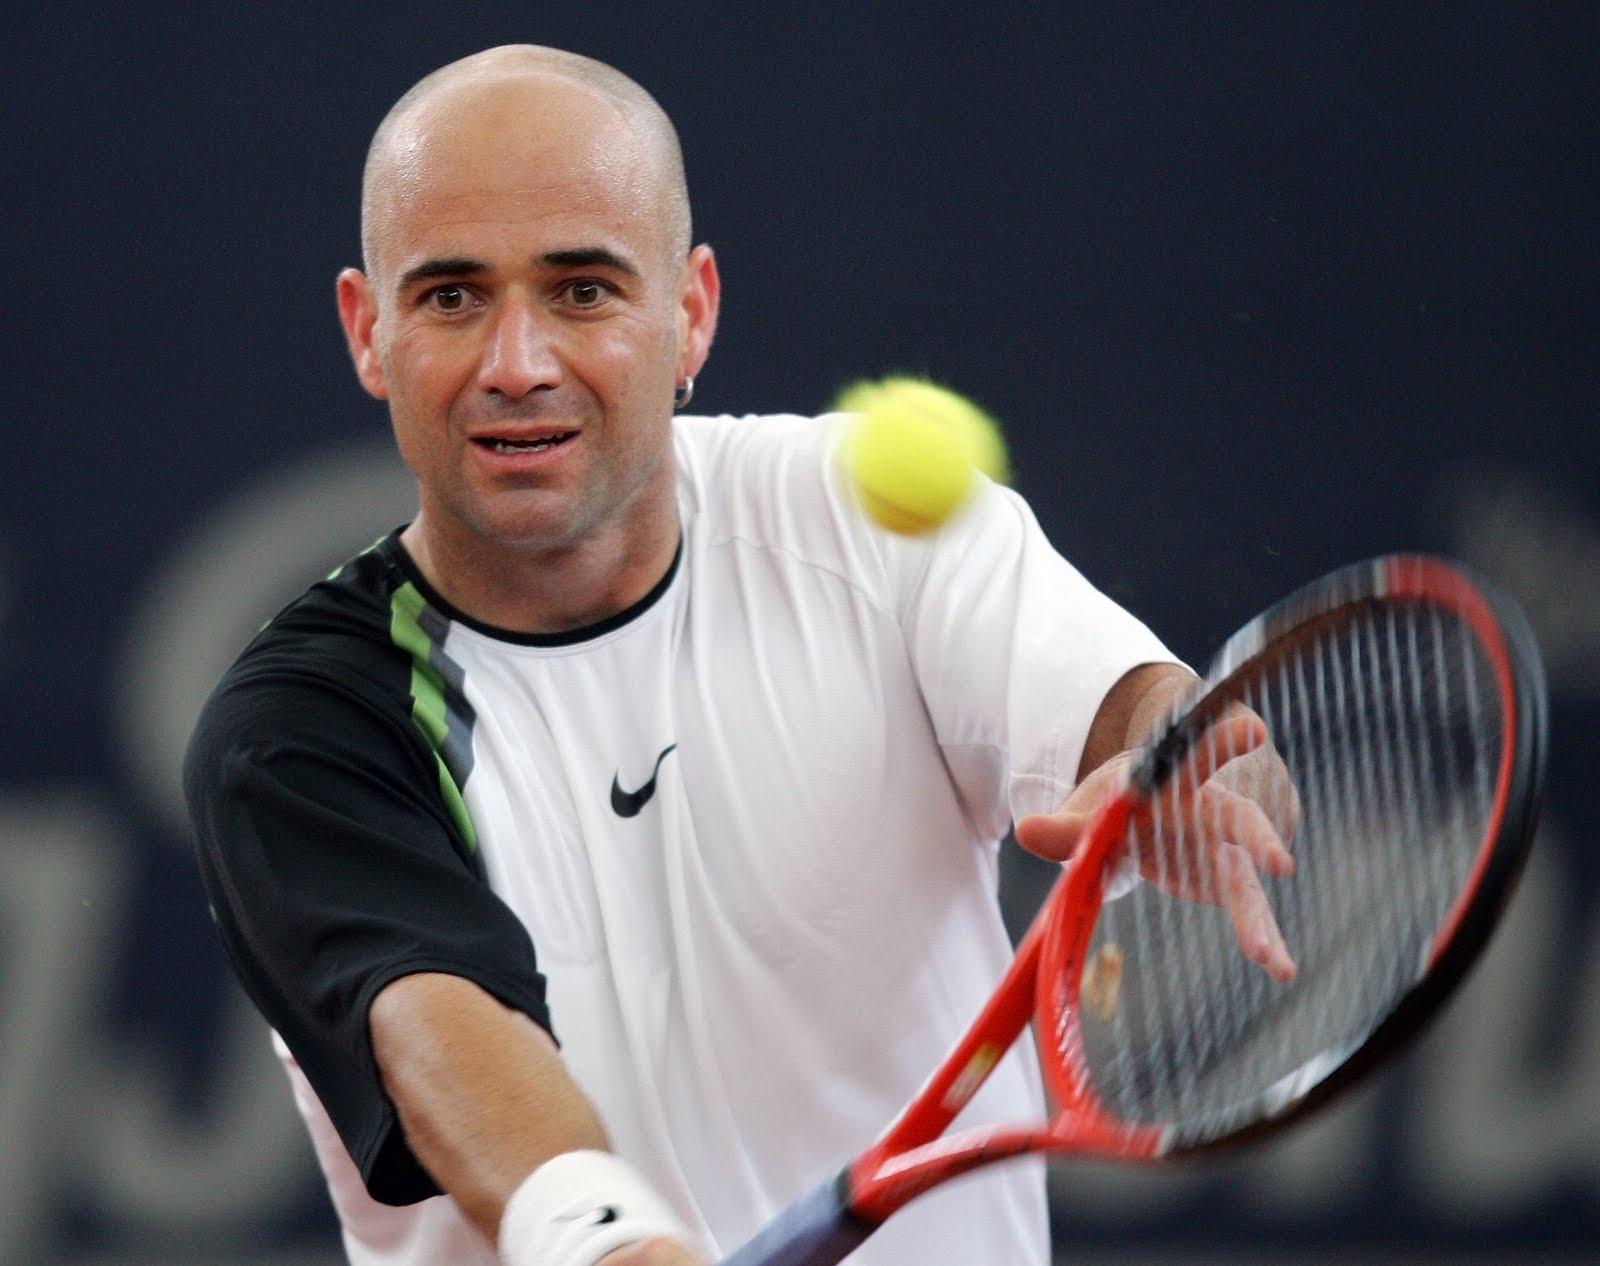 http://3.bp.blogspot.com/-FohjU7O0HtU/TkE87o6SREI/AAAAAAAAAV4/sFGKEskX1OU/s1600/Andre-Agassi-tennis-001.jpg